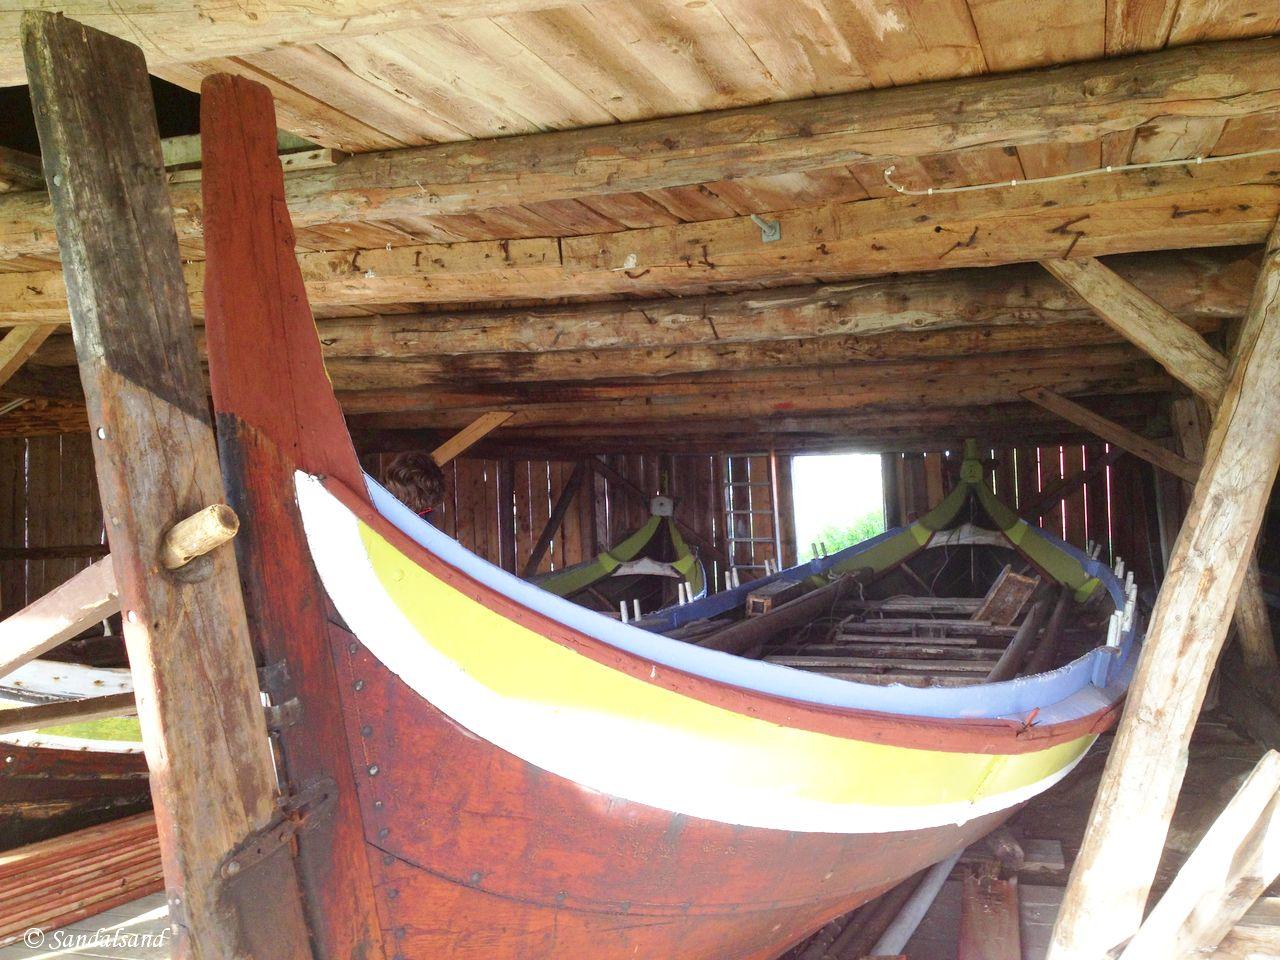 Norway - Nordland - Kjerringøy trading post - The small boat houses